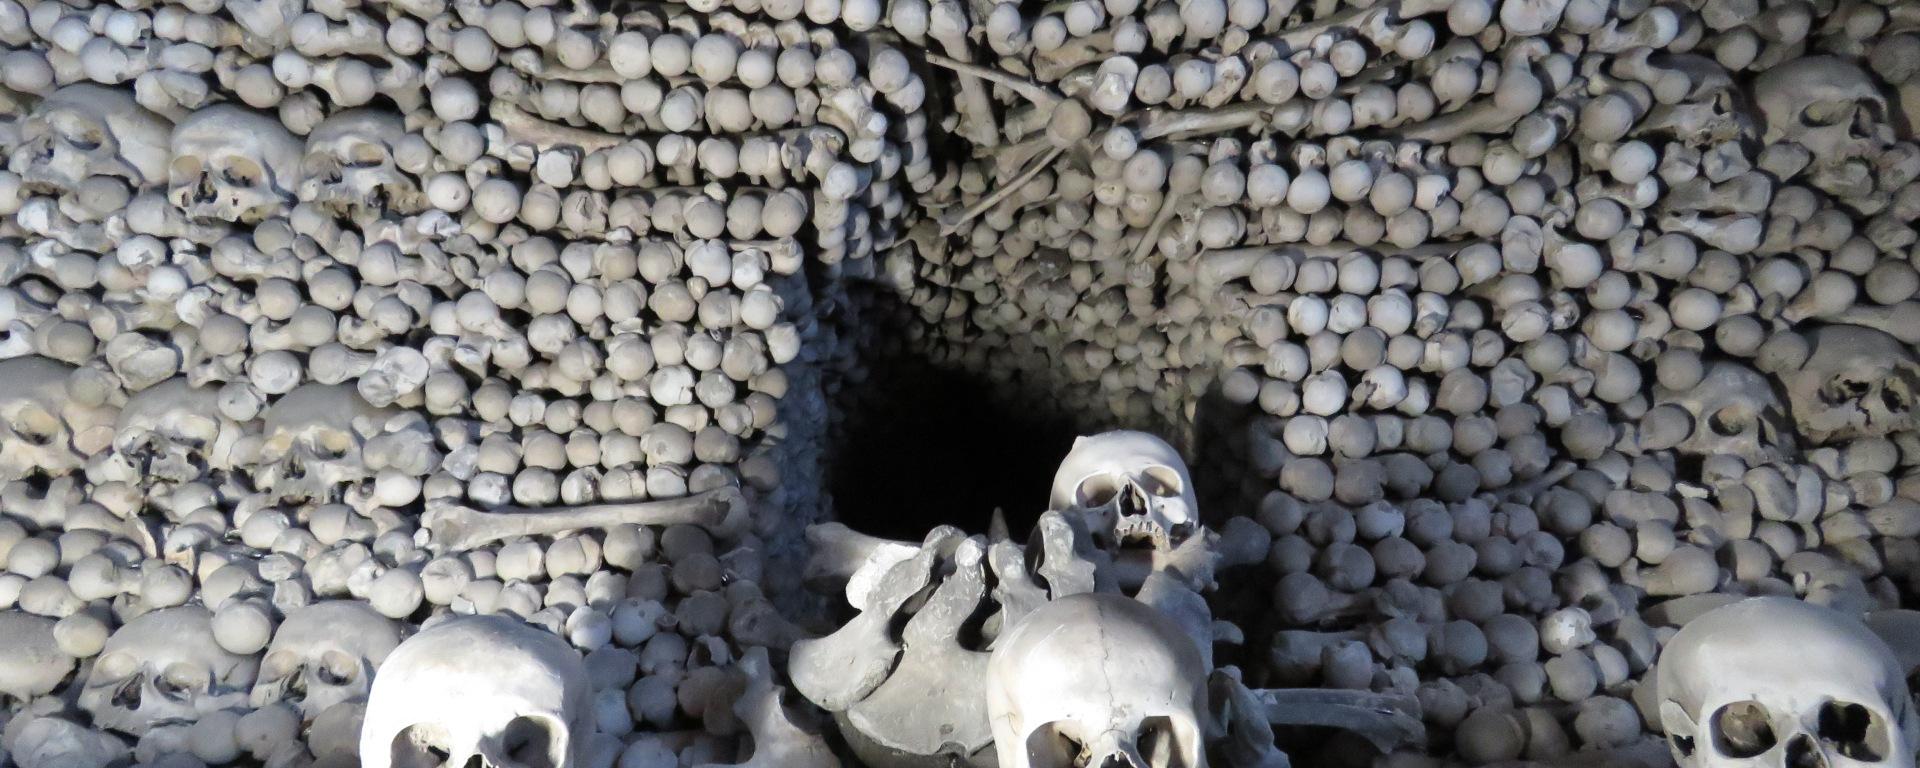 Skulls and Skeletons Up Close Sedlec Ossuary Kutna Hora - Read more at www.beautifulfillment.com